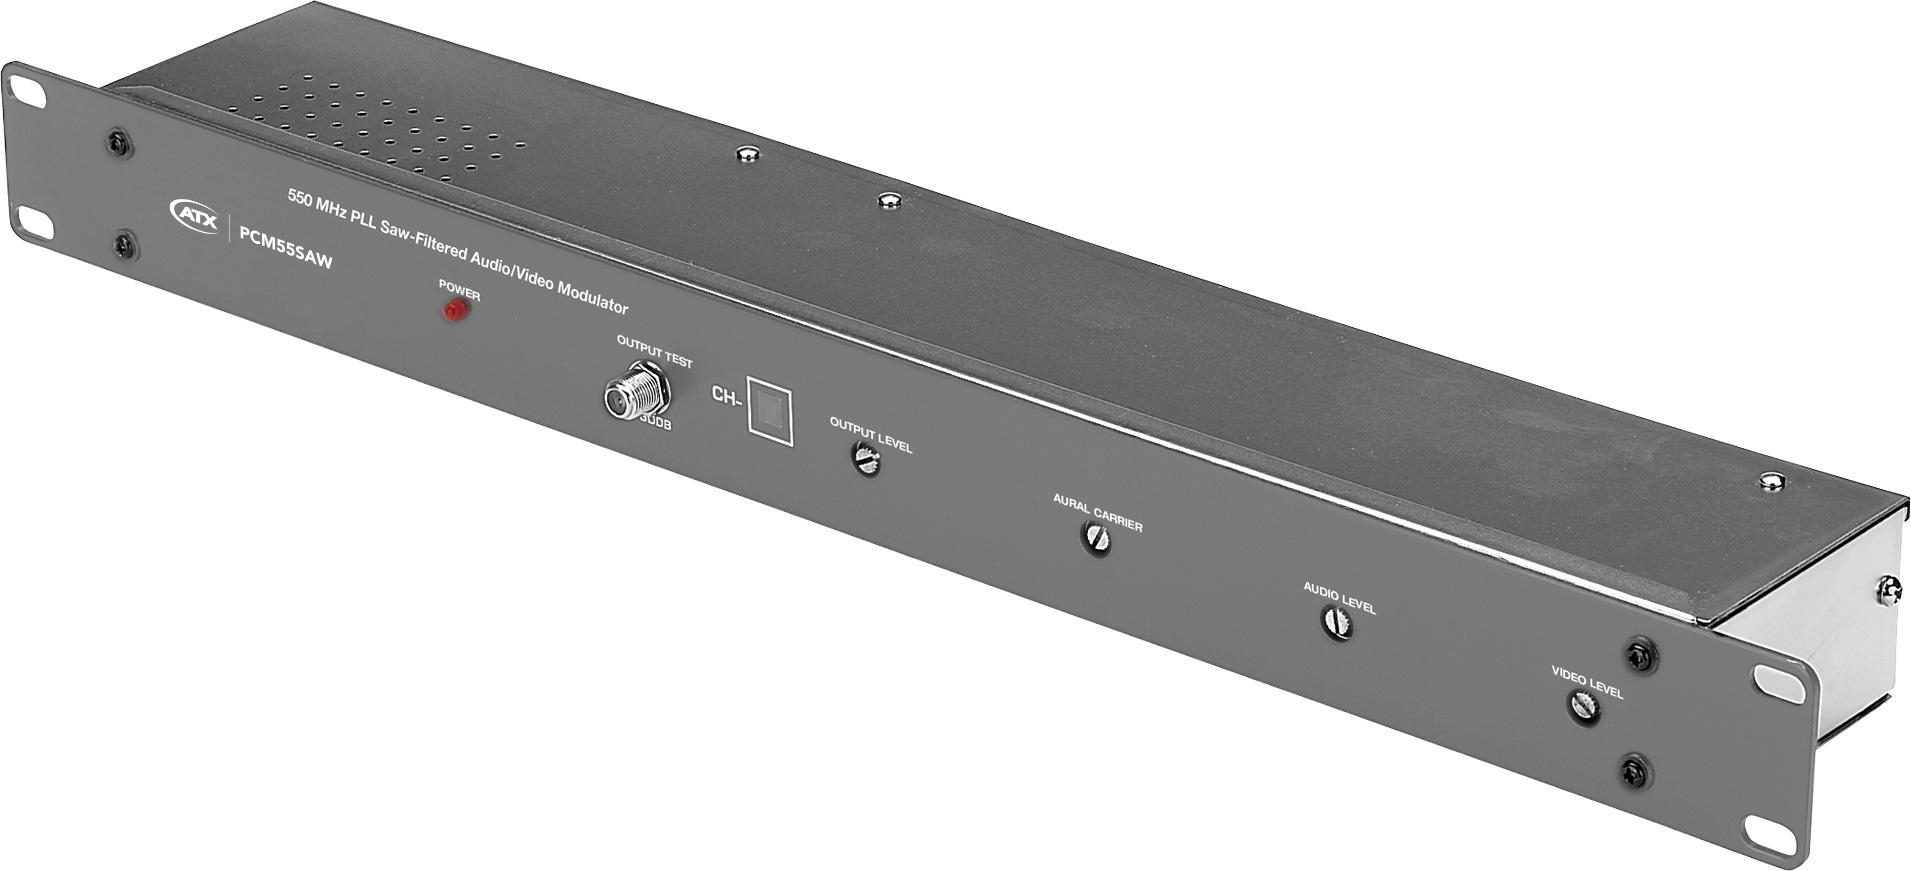 Pico Digital 1 Channel Crystal A/V Modulator - Channel P - 252-258 MHz